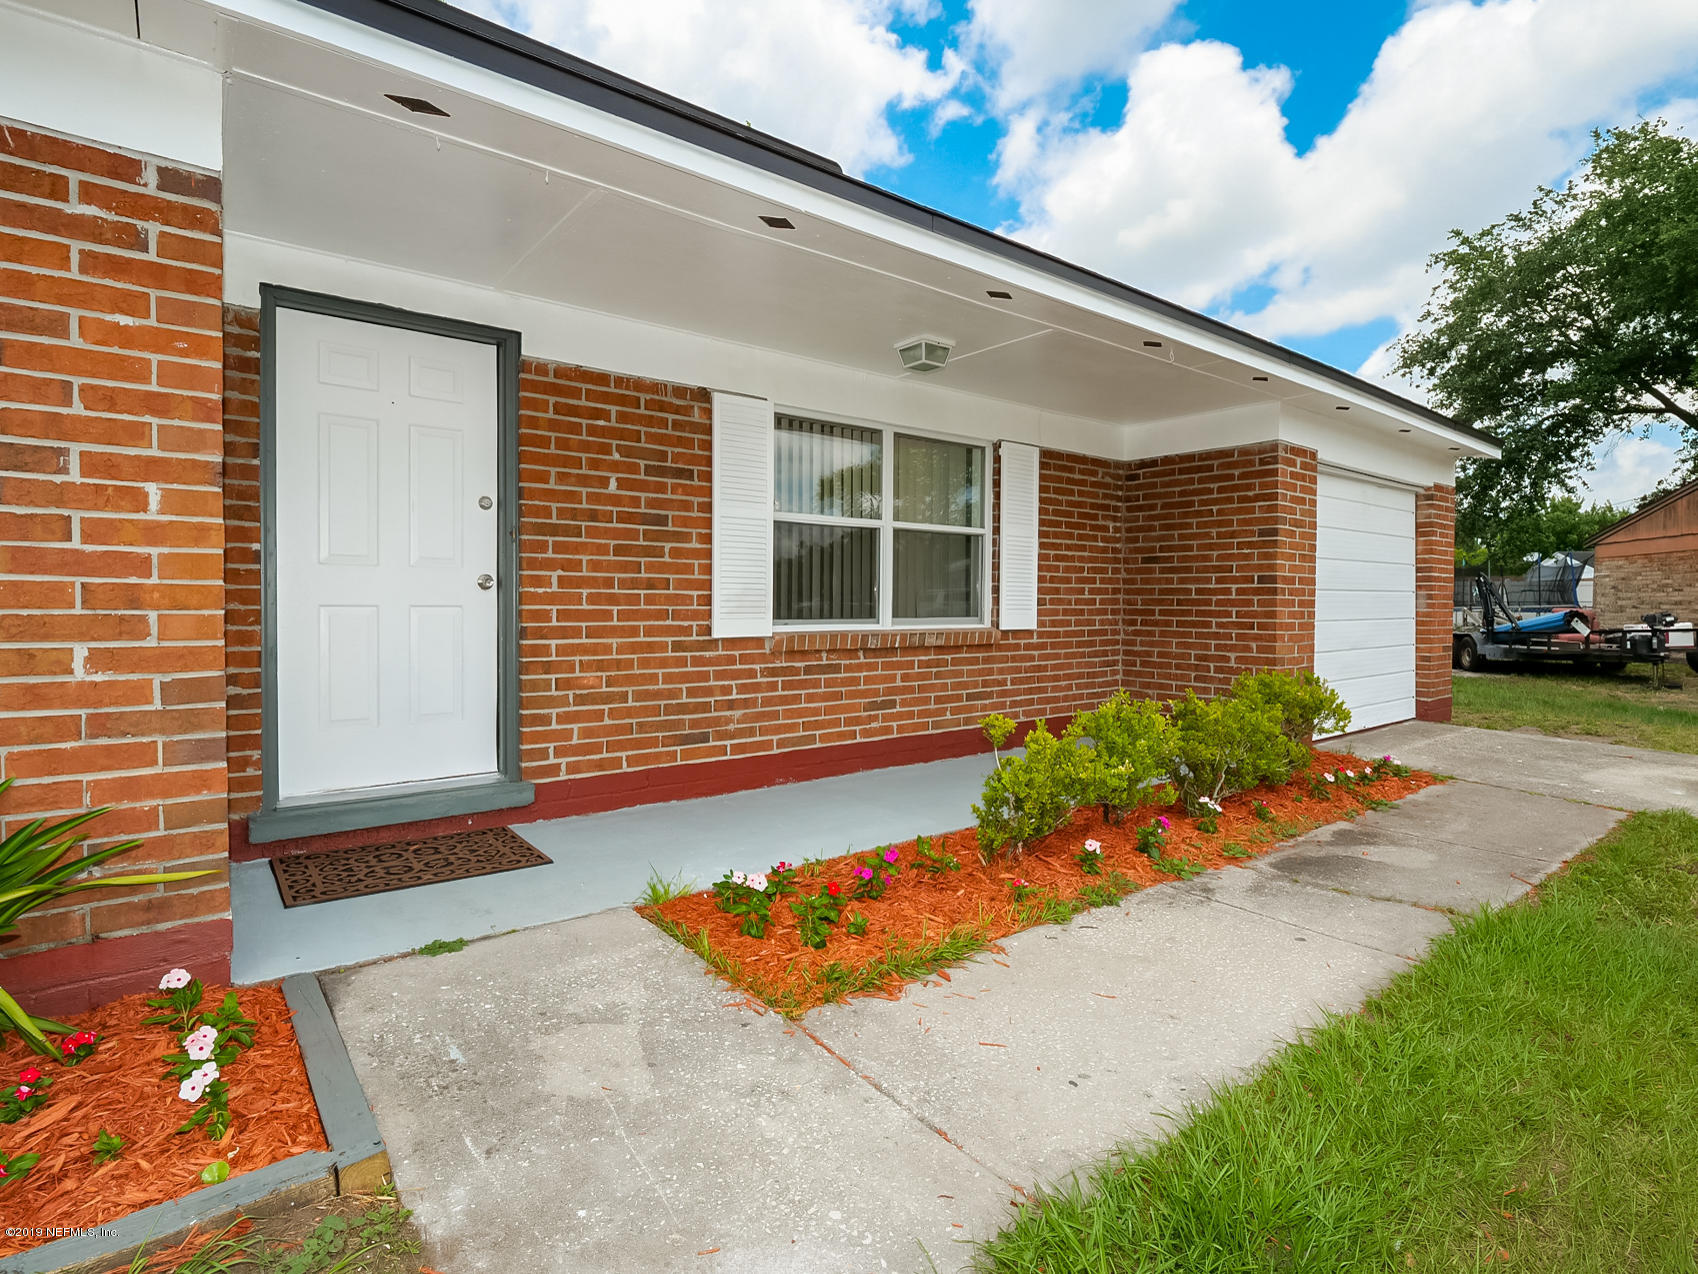 Photo of 2454 SEYMOUR, JACKSONVILLE, FL 32246